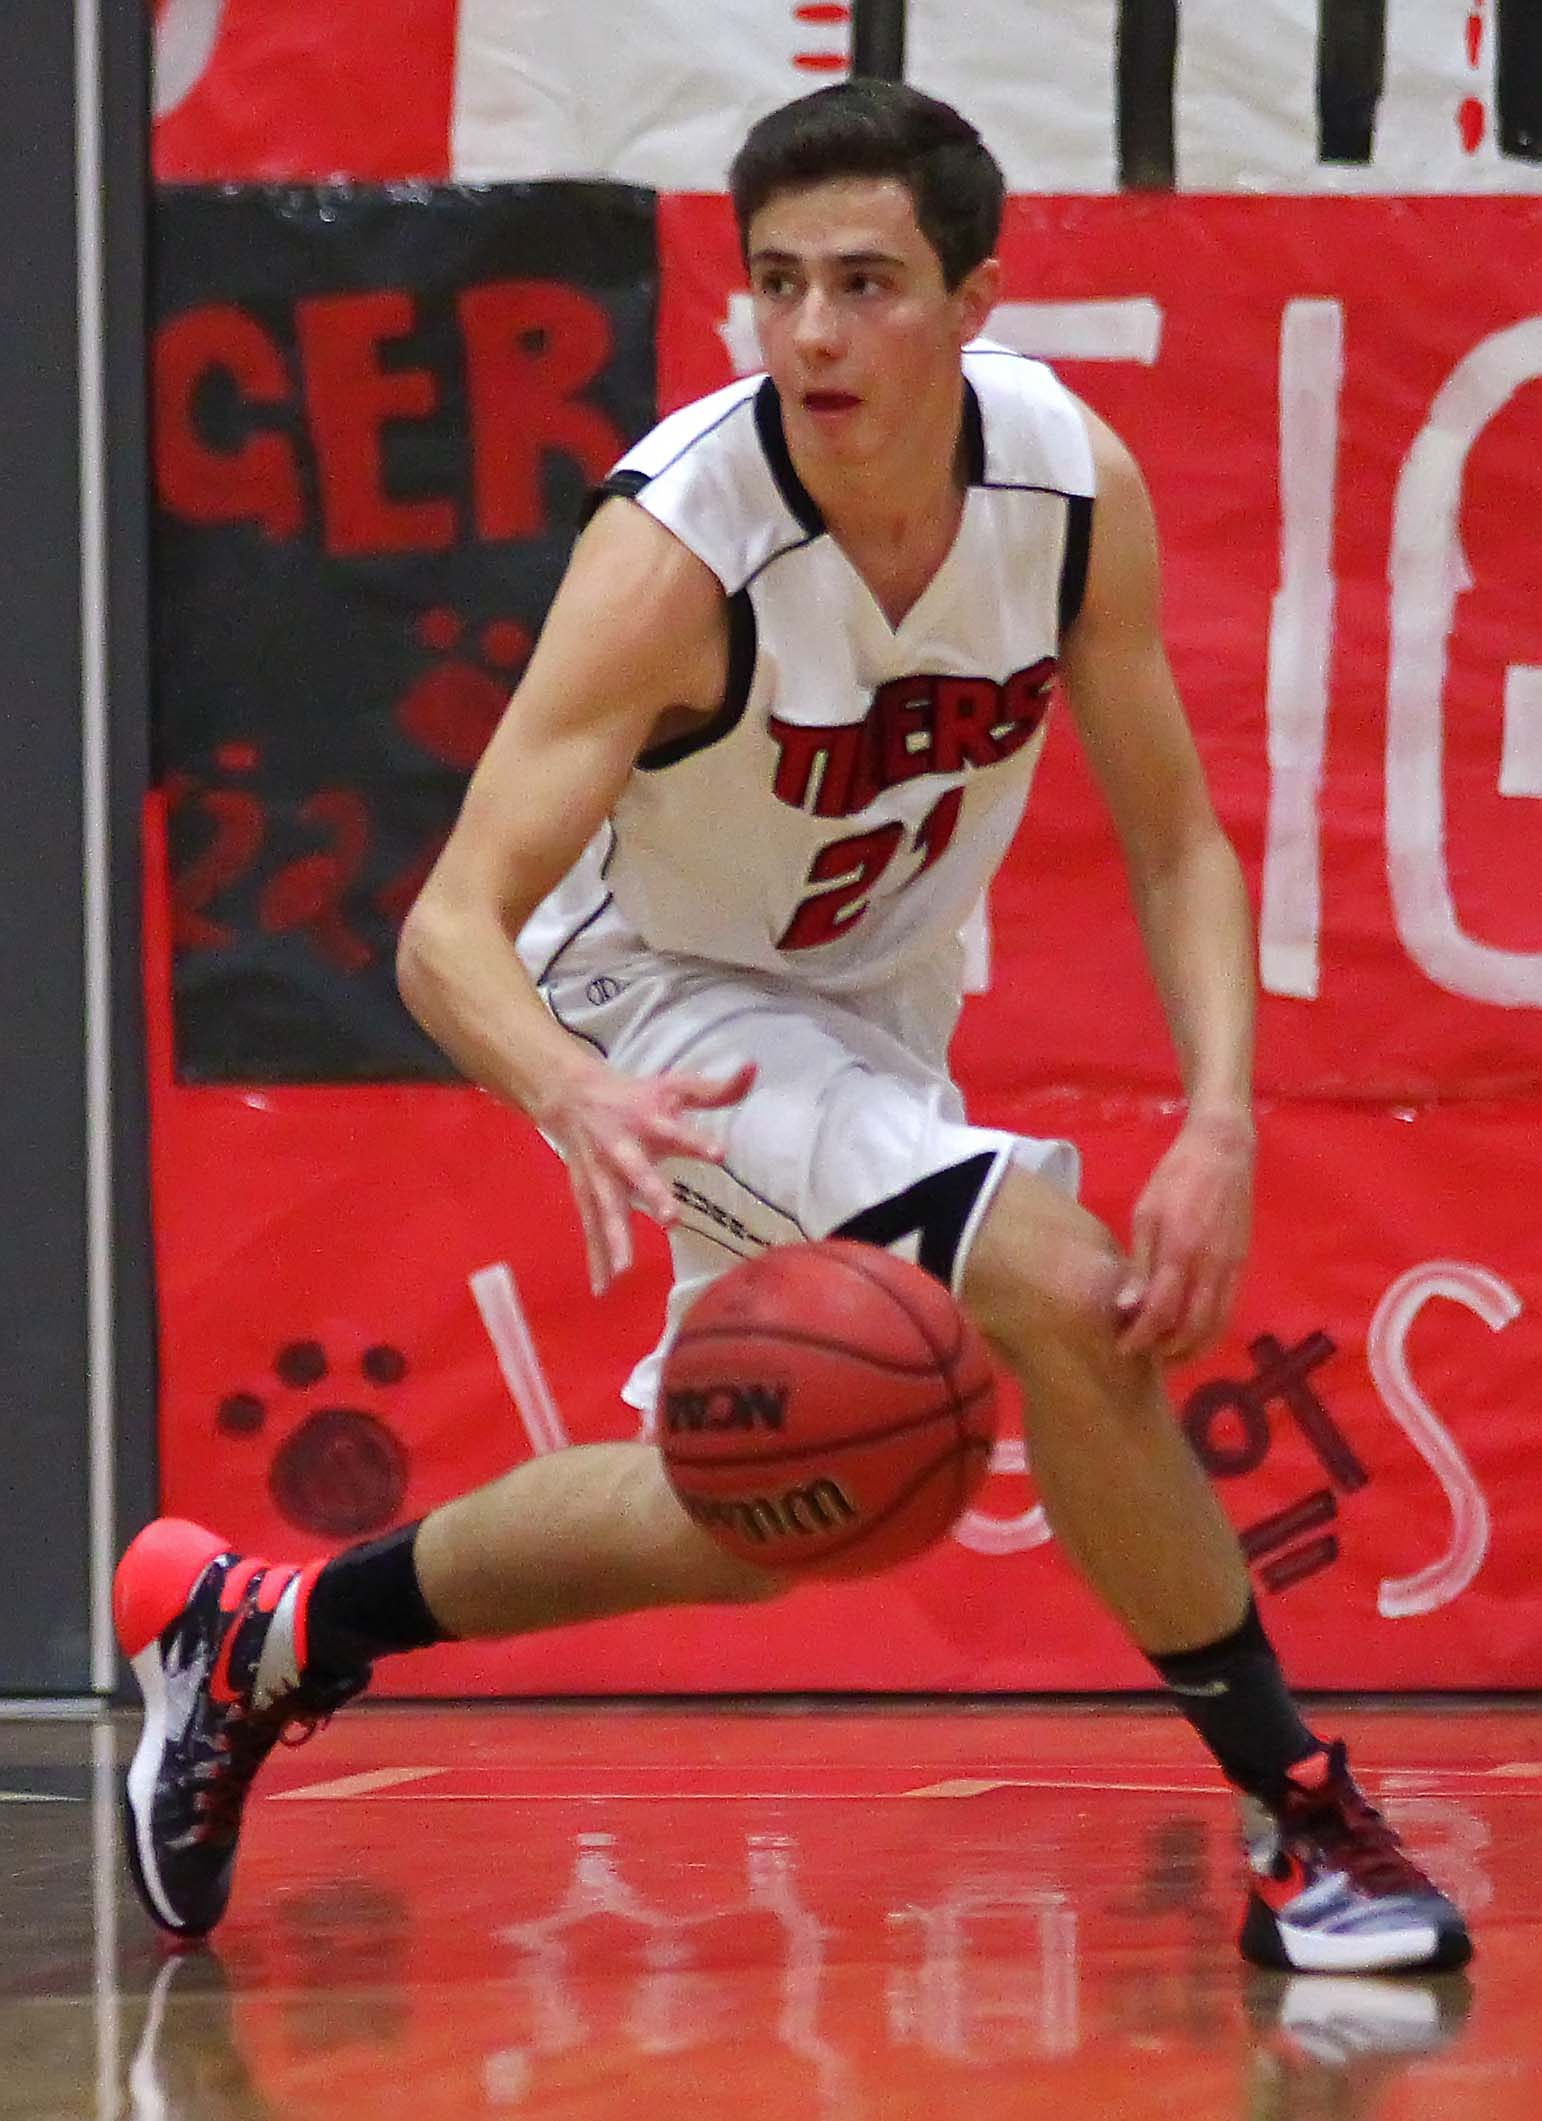 Hurricane's  Josh Parker (21), Hurricane vs. Richfield, Boys Basketball, Hurricane, Utah, Dec. 16, 2015, | File photo by Robert Hoppie, ASPpix.com, St. George News